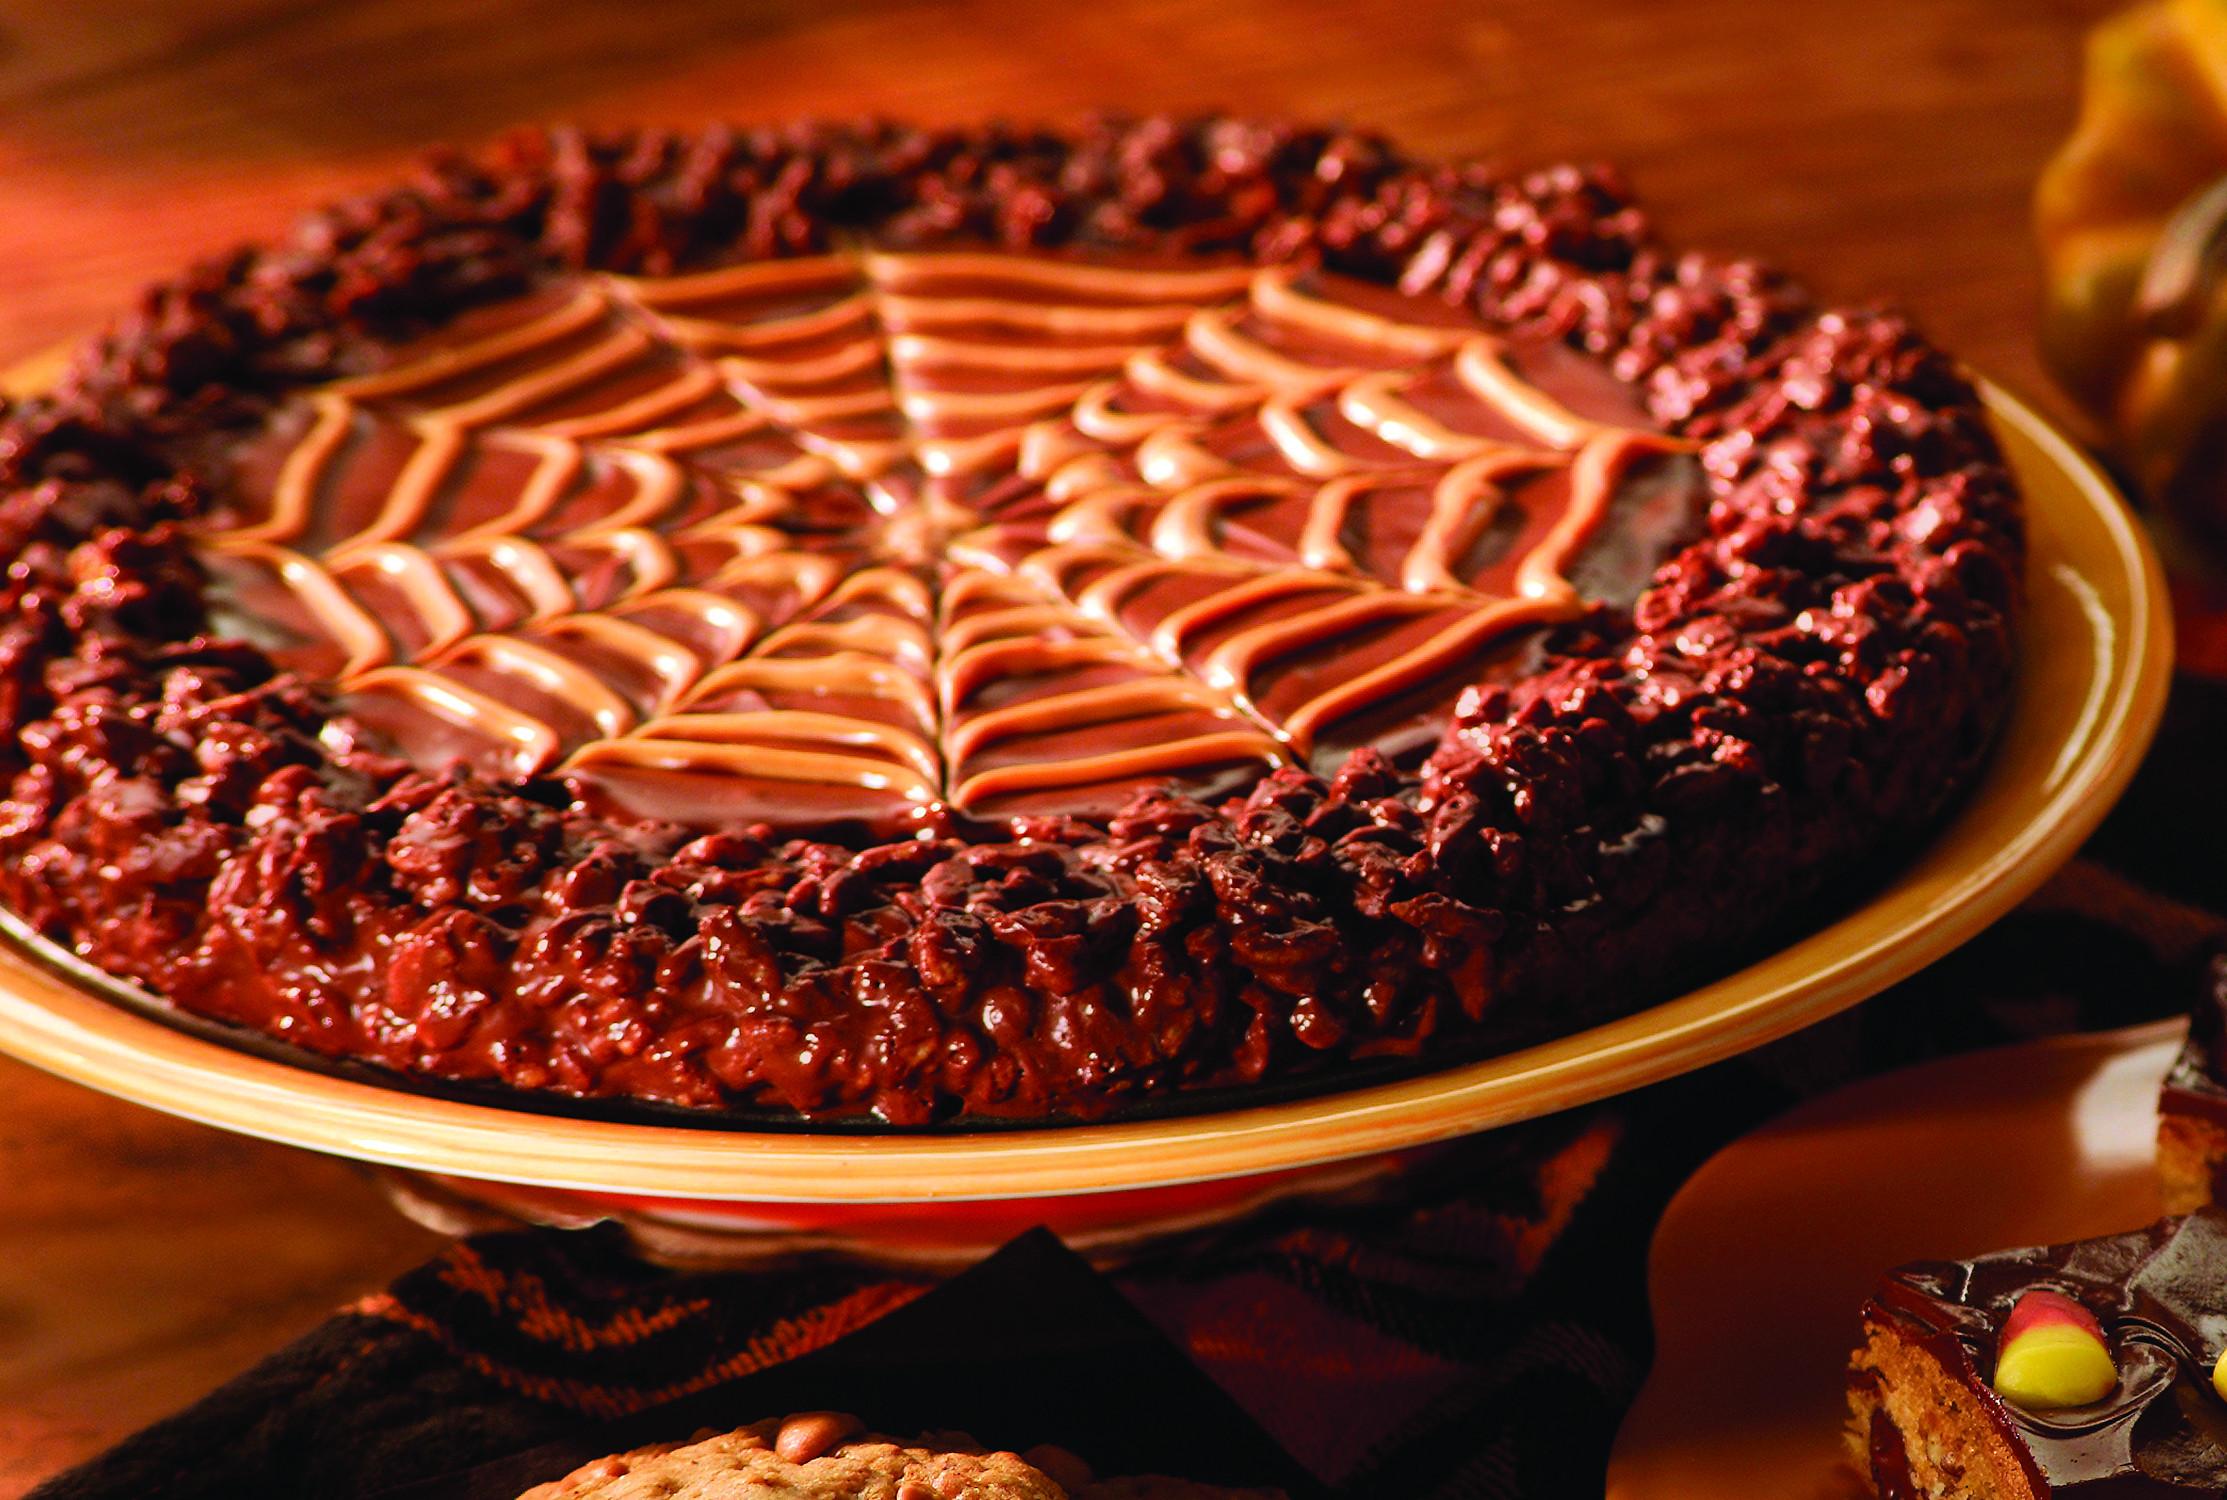 Halloween Desserts Recipes  Two Recipes for Festive Halloween Desserts NY Metro